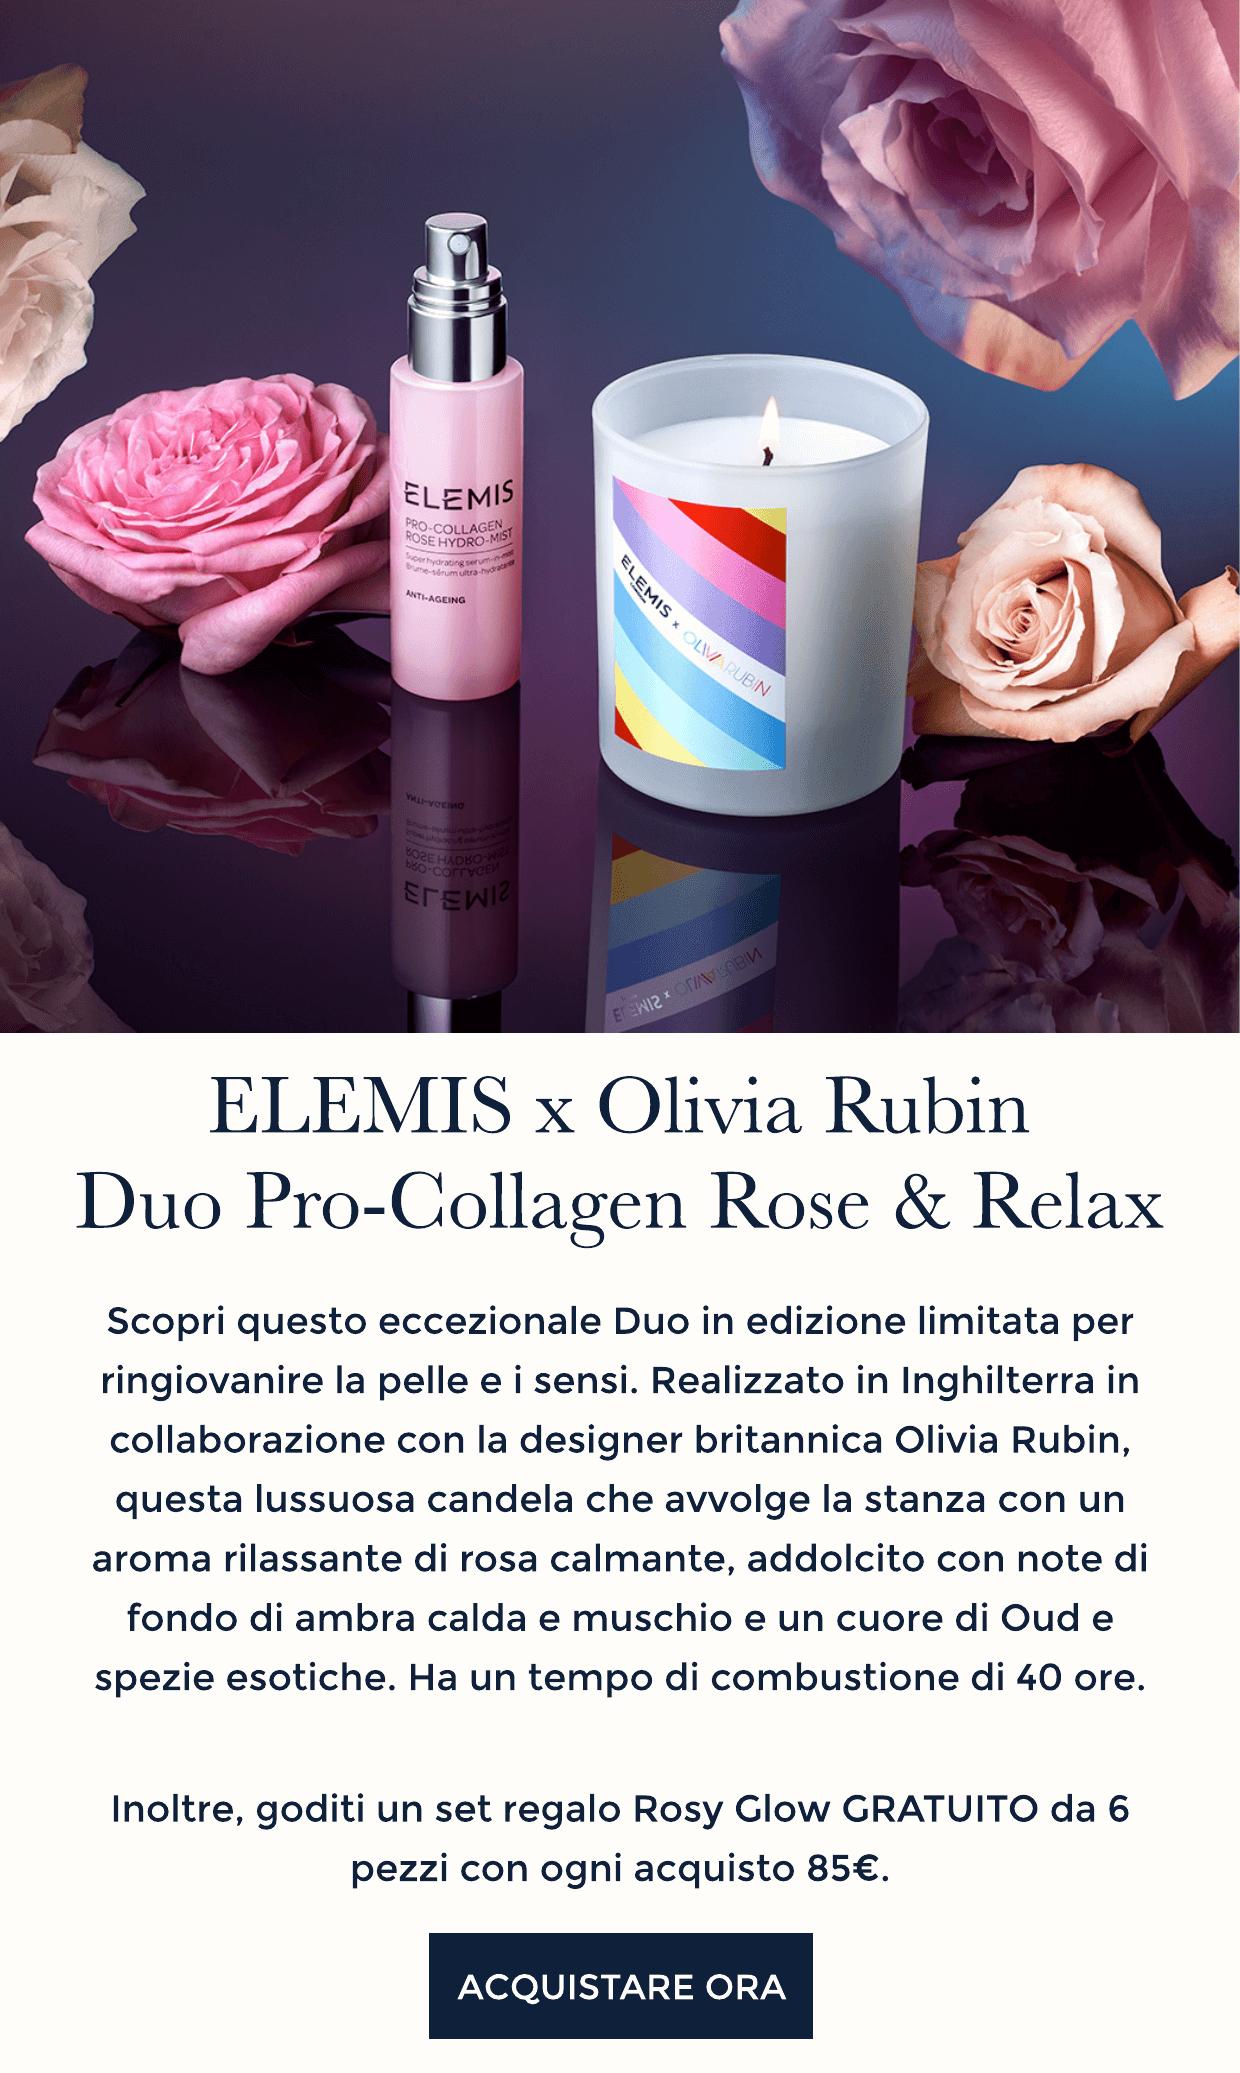 ELEMIS x Olivia Rubin Pro-Collagen Duo